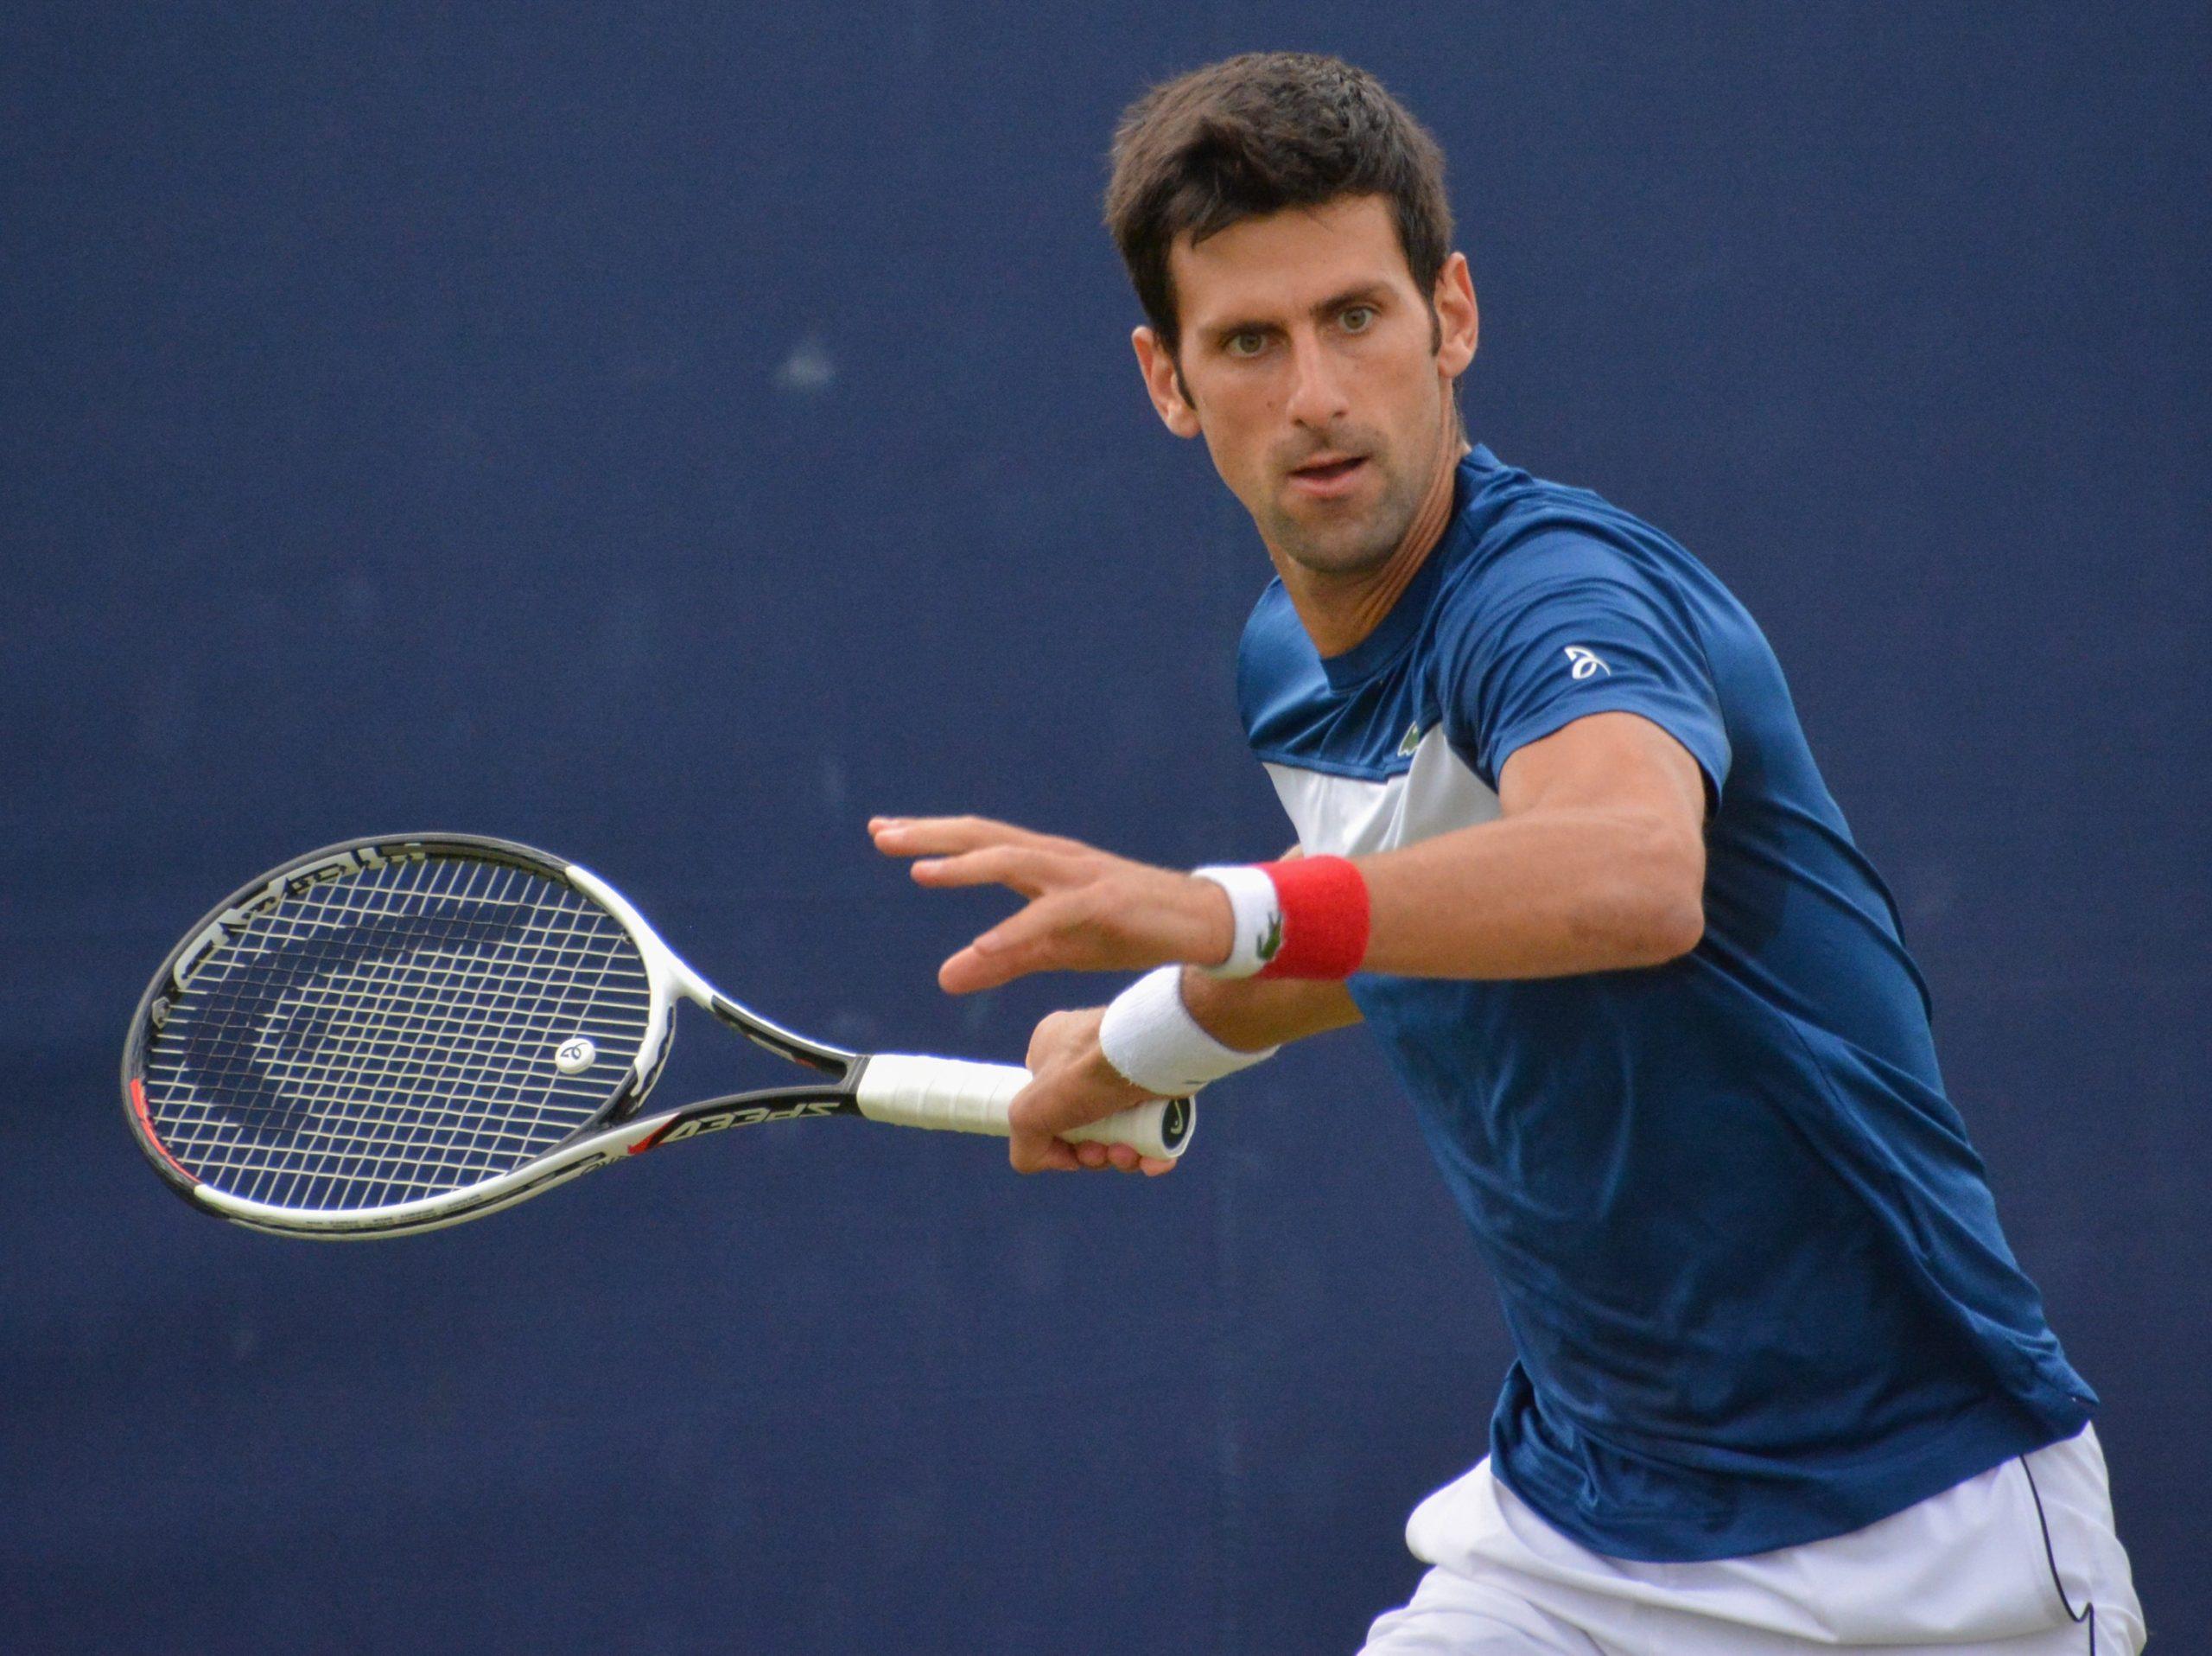 Novak Djokovic l'eterno terzo incomodo che insegue Federer e Nadal